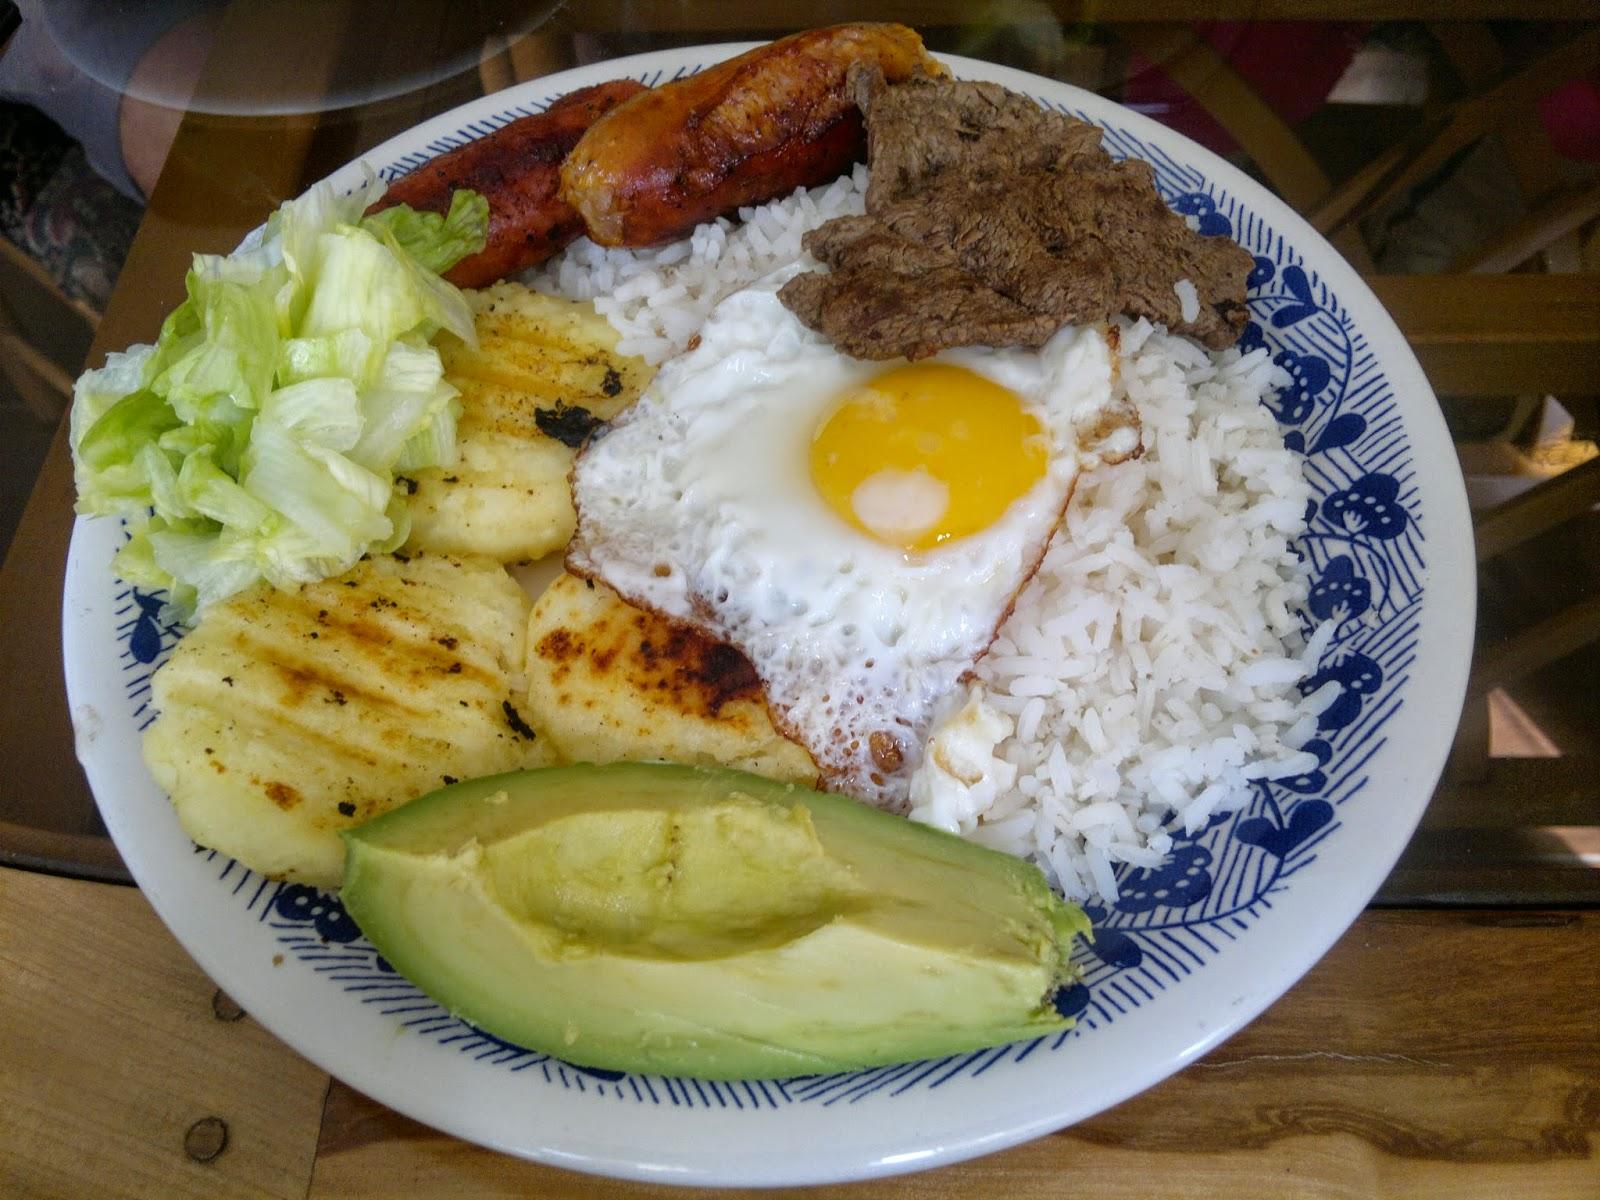 Recetas de cocina ecuatoriana llapingacho casero muy for Comidas para preparar rapido y facil